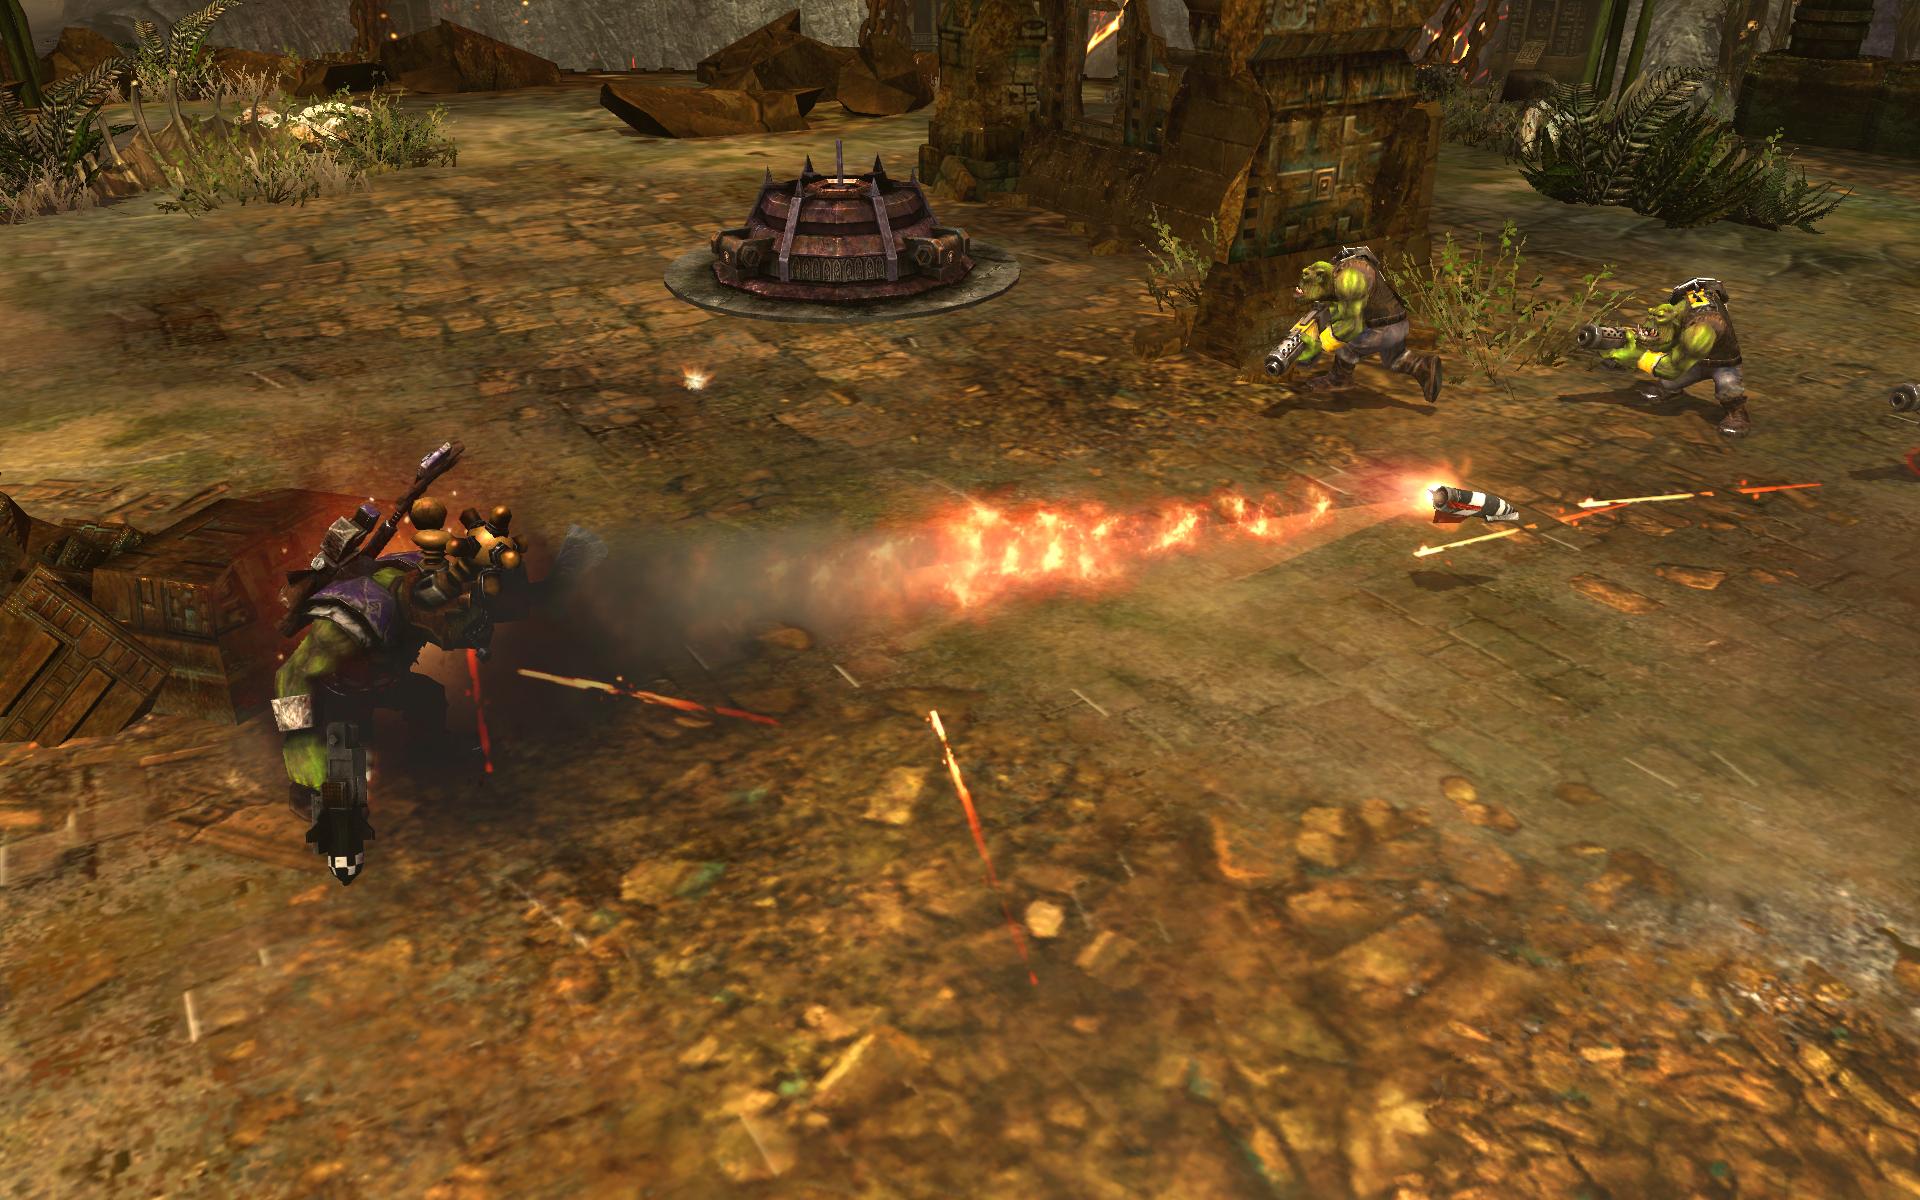 Warhammer 40,000: Dawn of War II - Retribution - Mekboy Wargear DLC screenshot